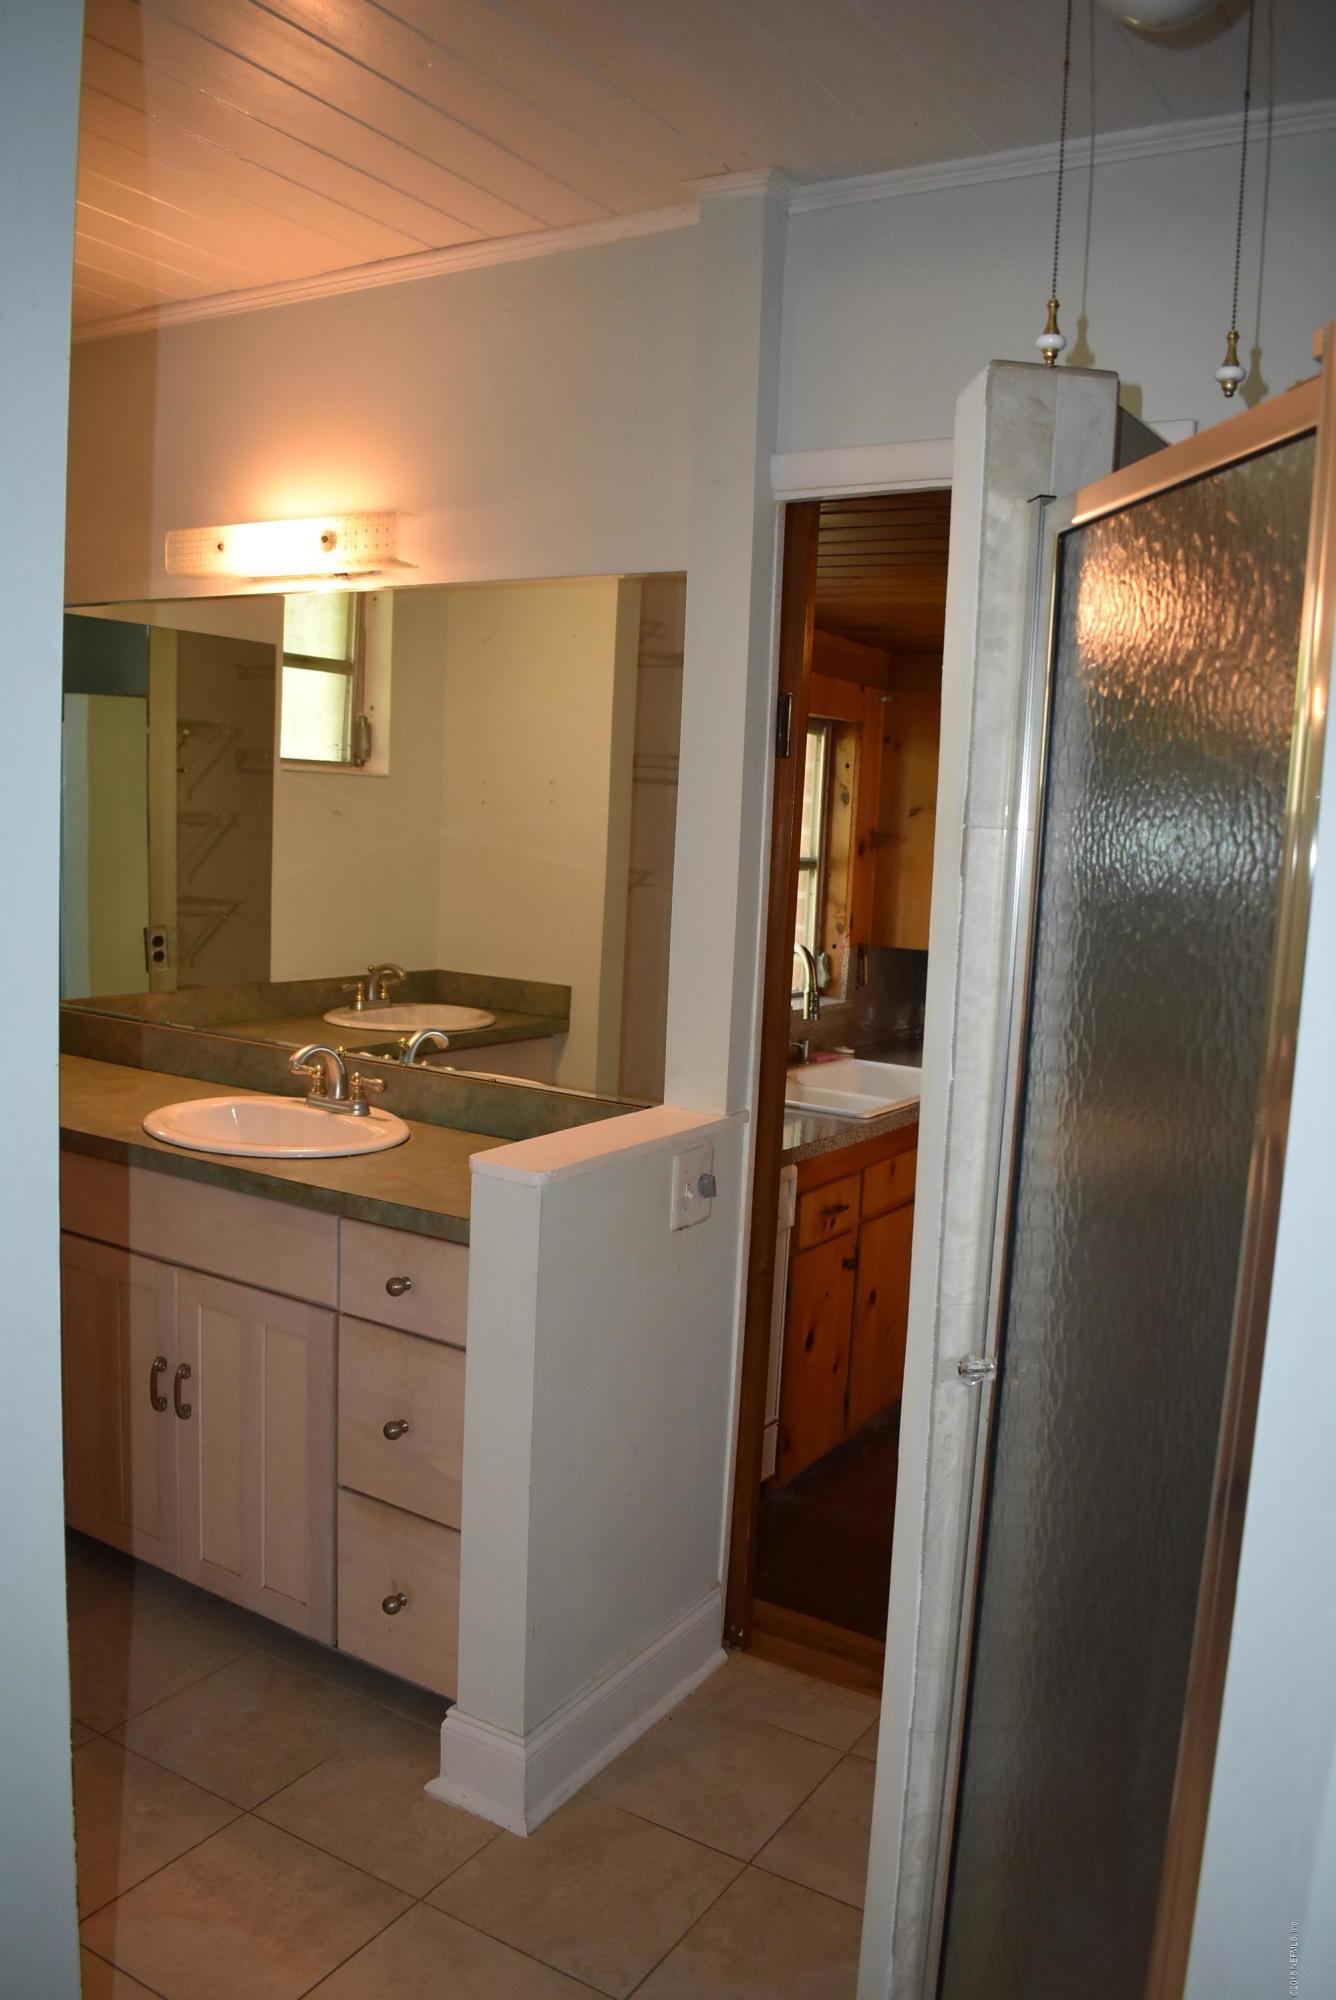 1908 MORNINGSIDE, JACKSONVILLE, FLORIDA 32205, 4 Bedrooms Bedrooms, ,3 BathroomsBathrooms,Residential - single family,For sale,MORNINGSIDE,942759